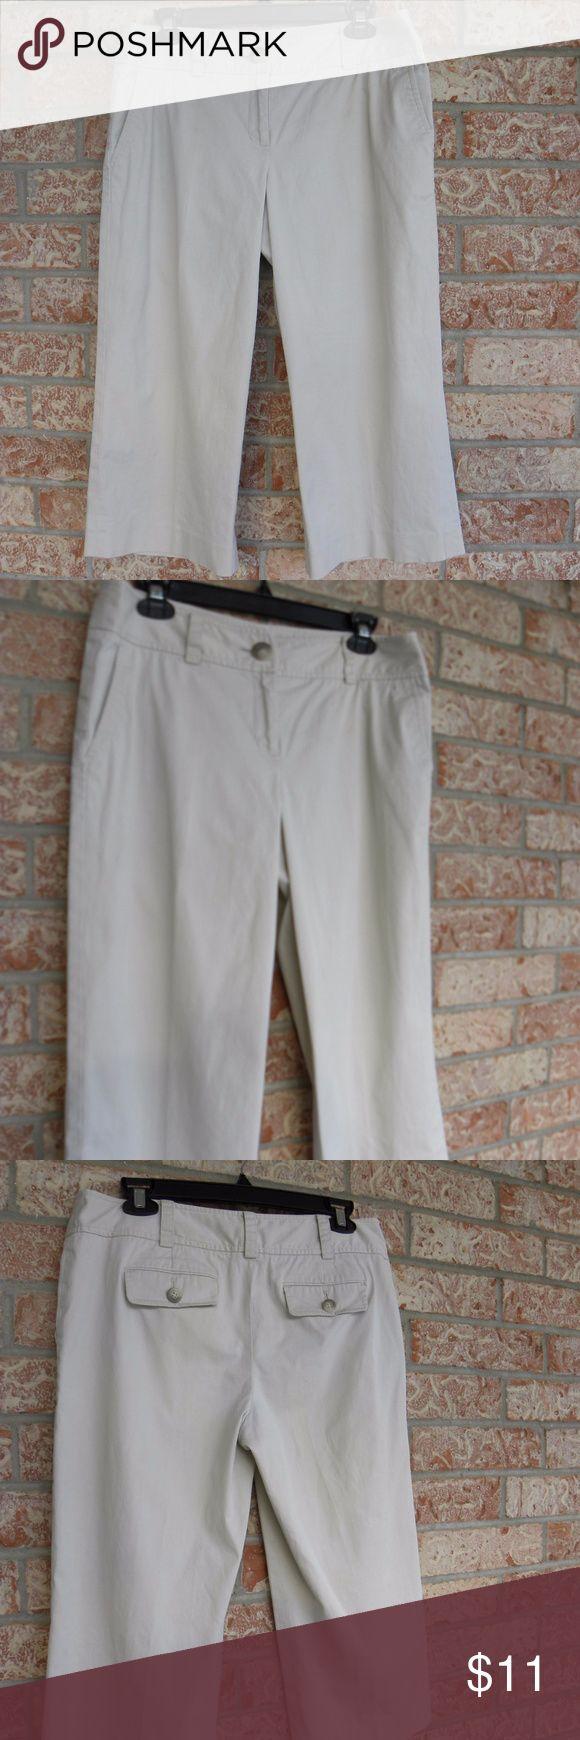 "Ann Taylor Capri Pants Khaki Size 8 Ann Taylor  Capri Pants  Khaki Color  Size 8  Women's pants Cotton  Measures flat surface one side waist: 17"" hips: 19  Zipper and button closure. Ann Taylor Pants Capris"